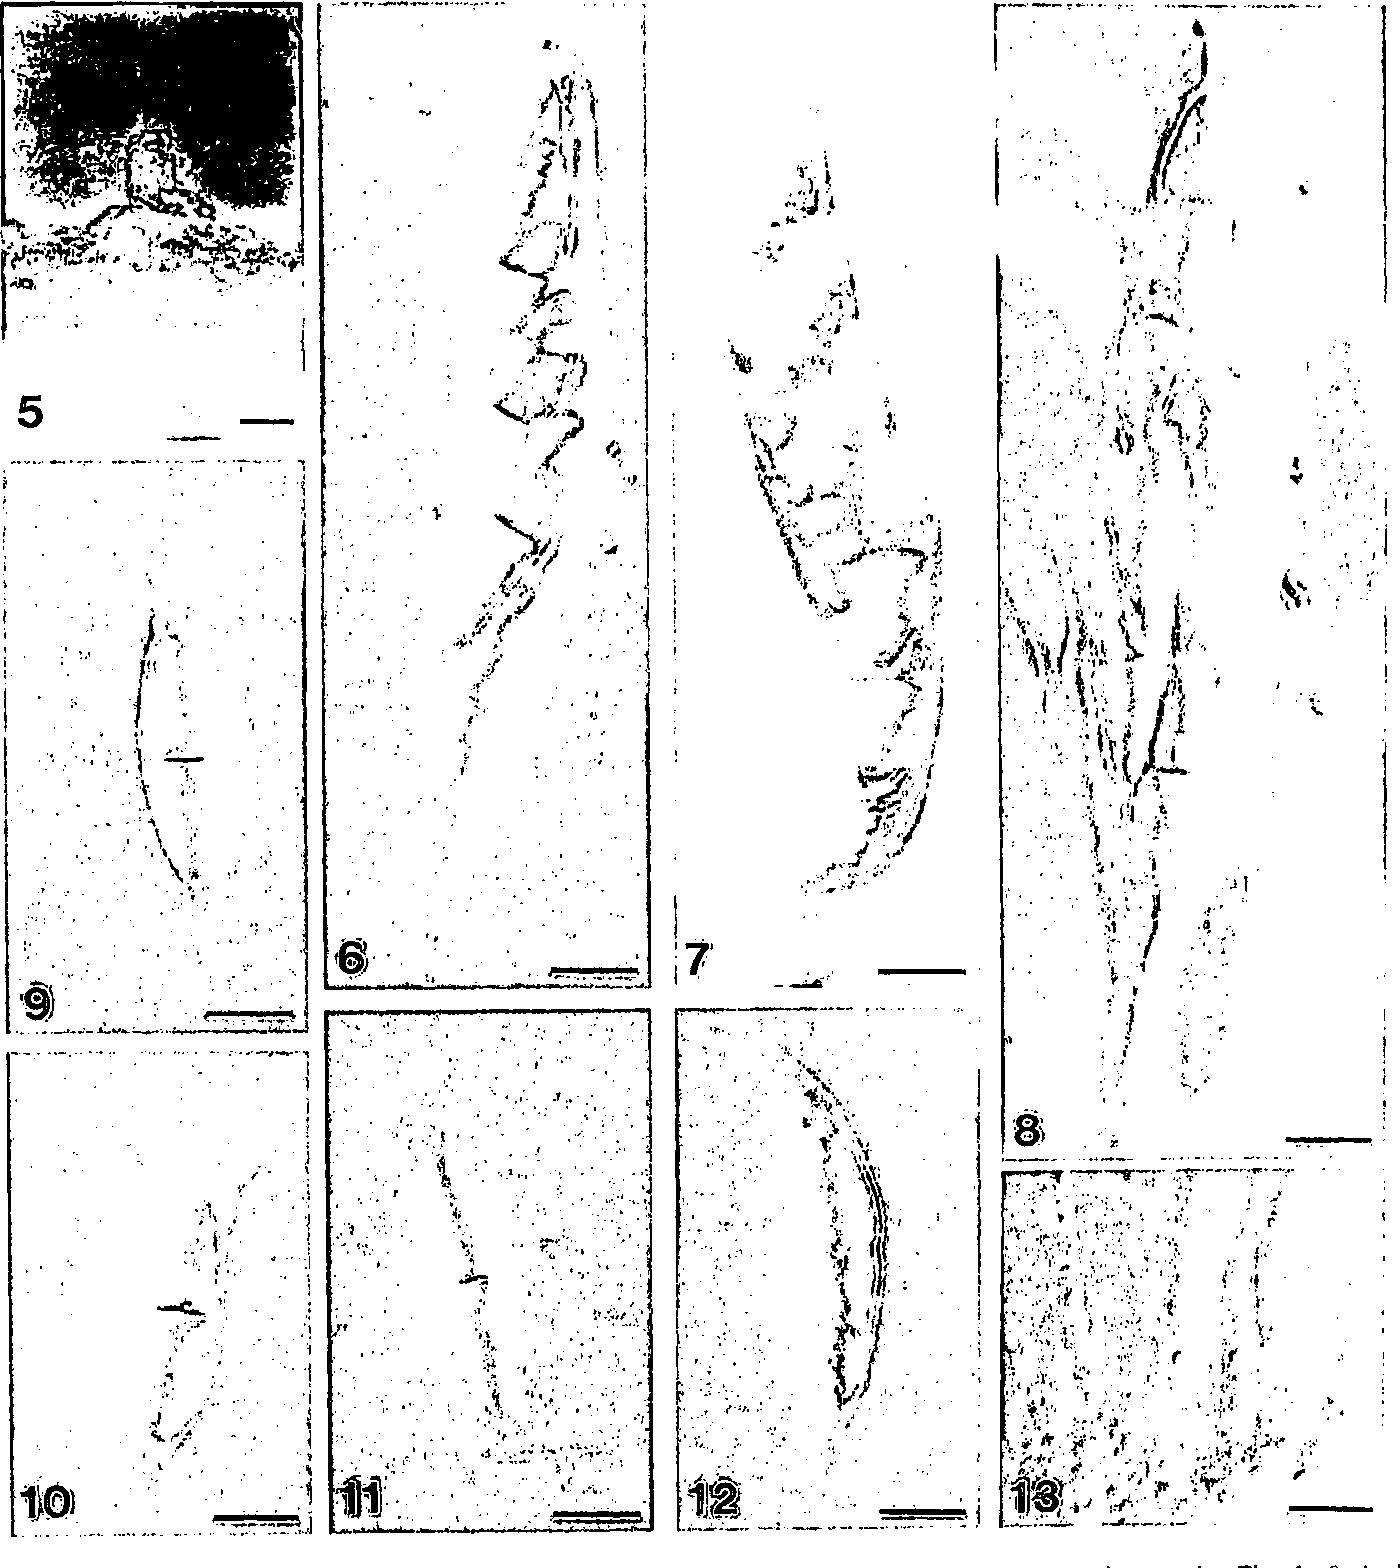 figure 5-13